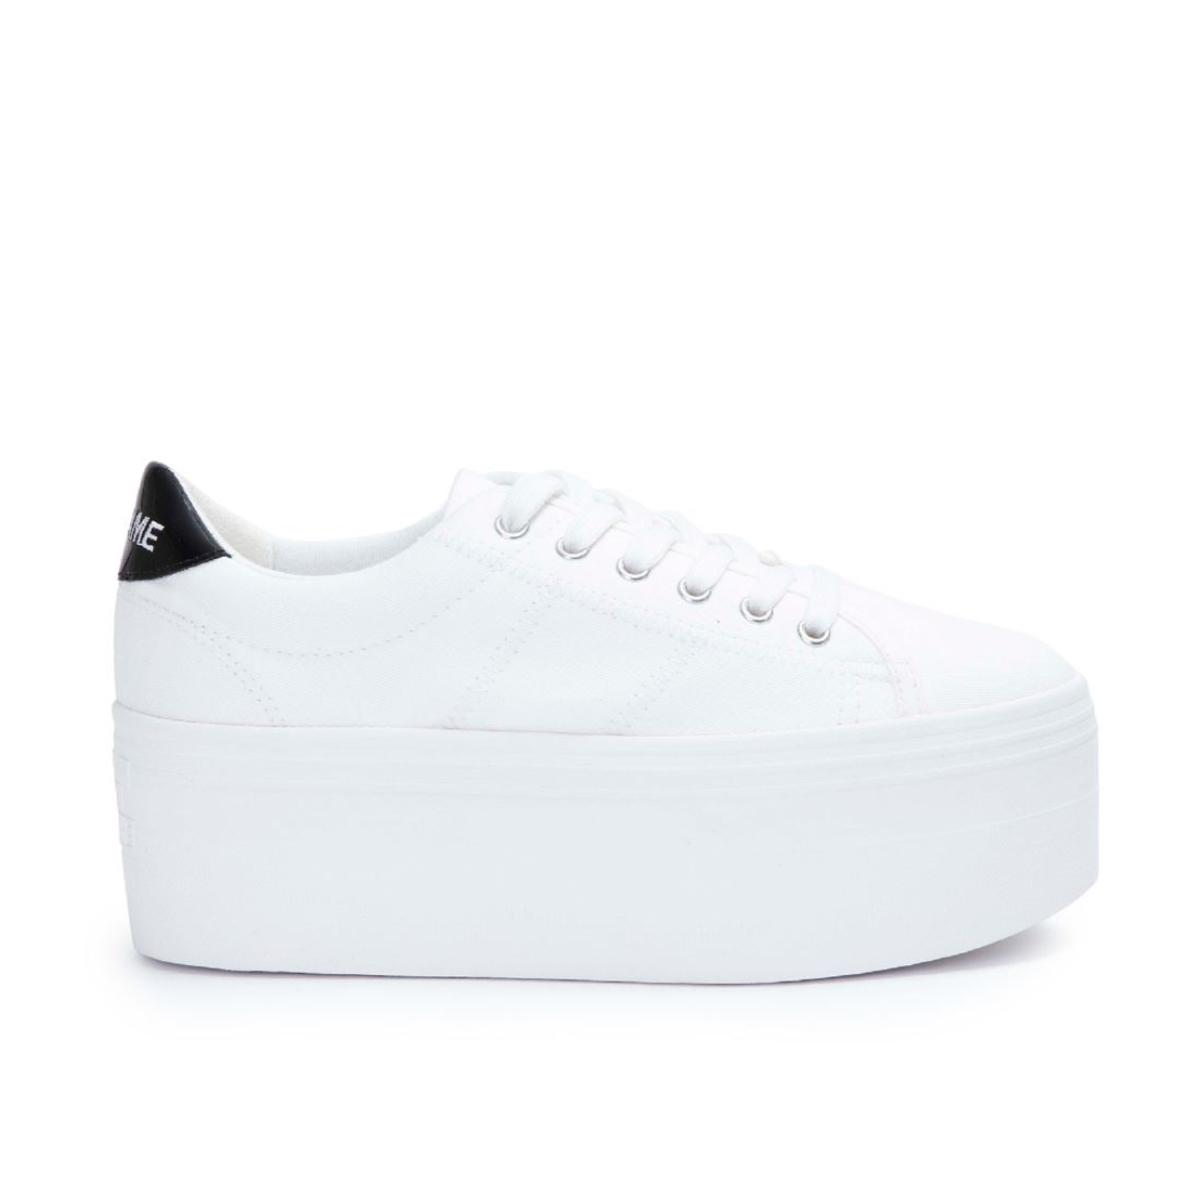 PLATO-11350-WHITE プラト ホワイト